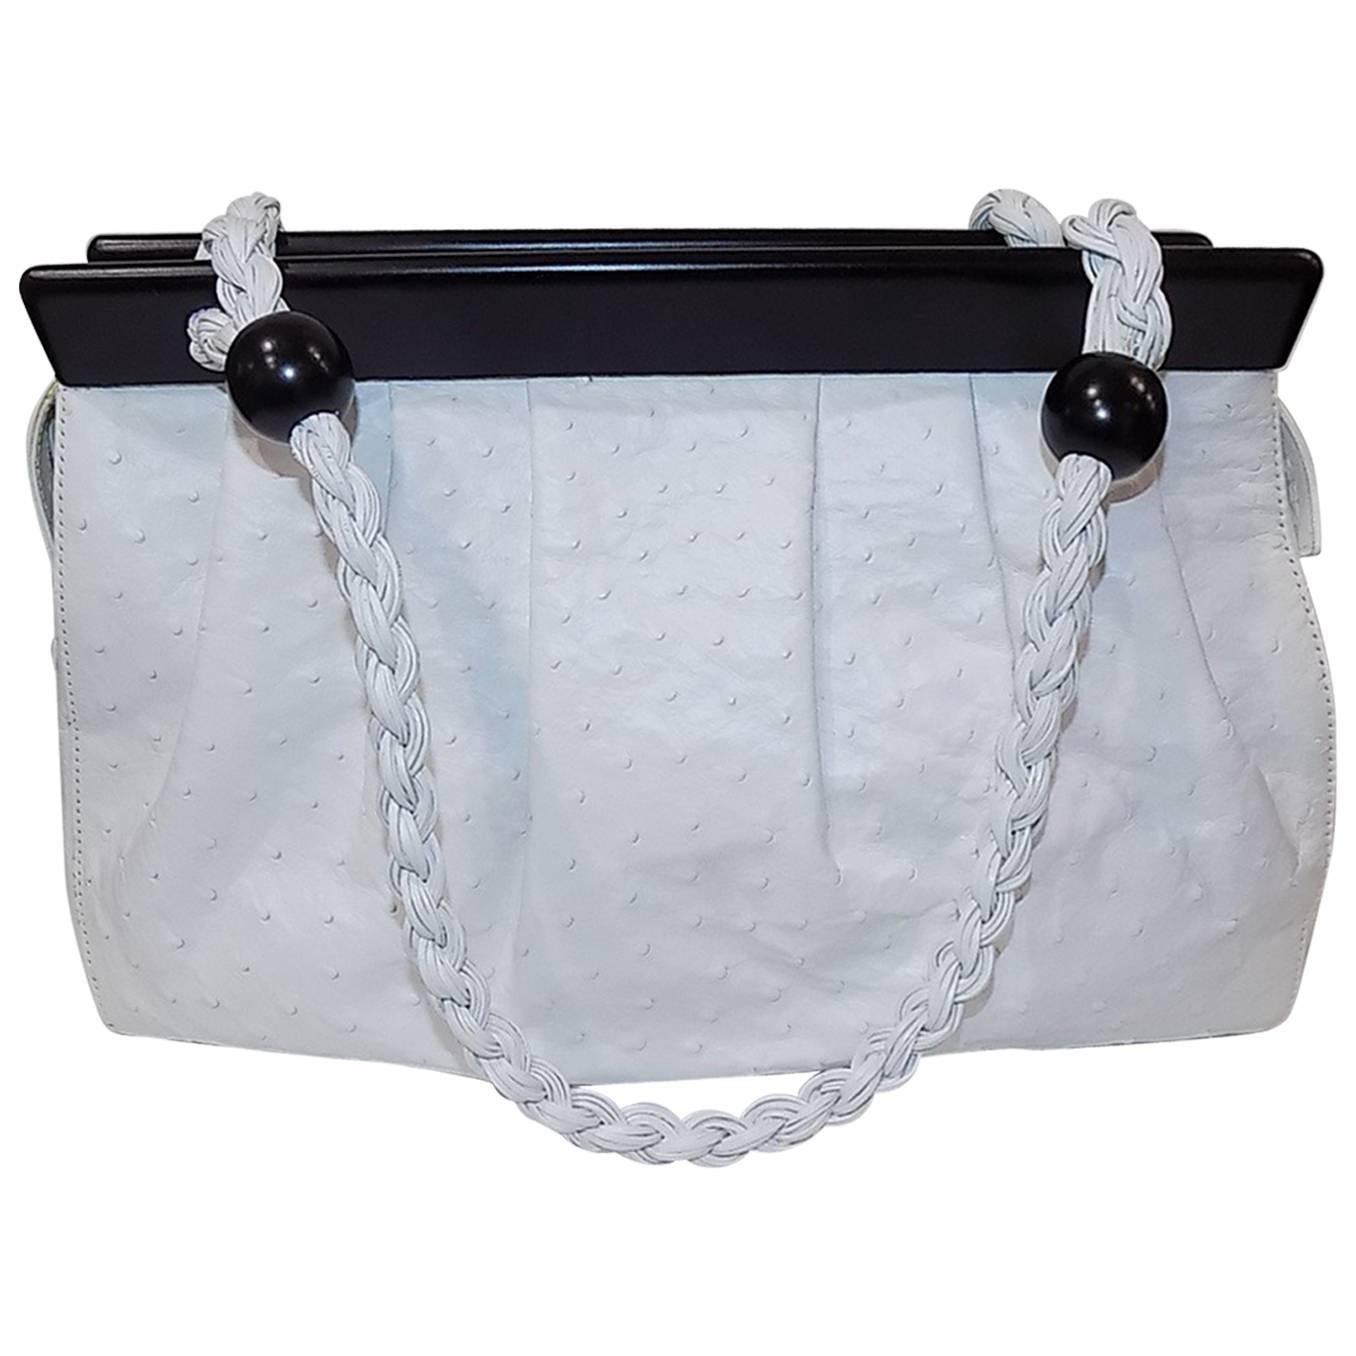 Casa Suarez New White Ostrich Bag With Ebony Frame TP2uYN3l7